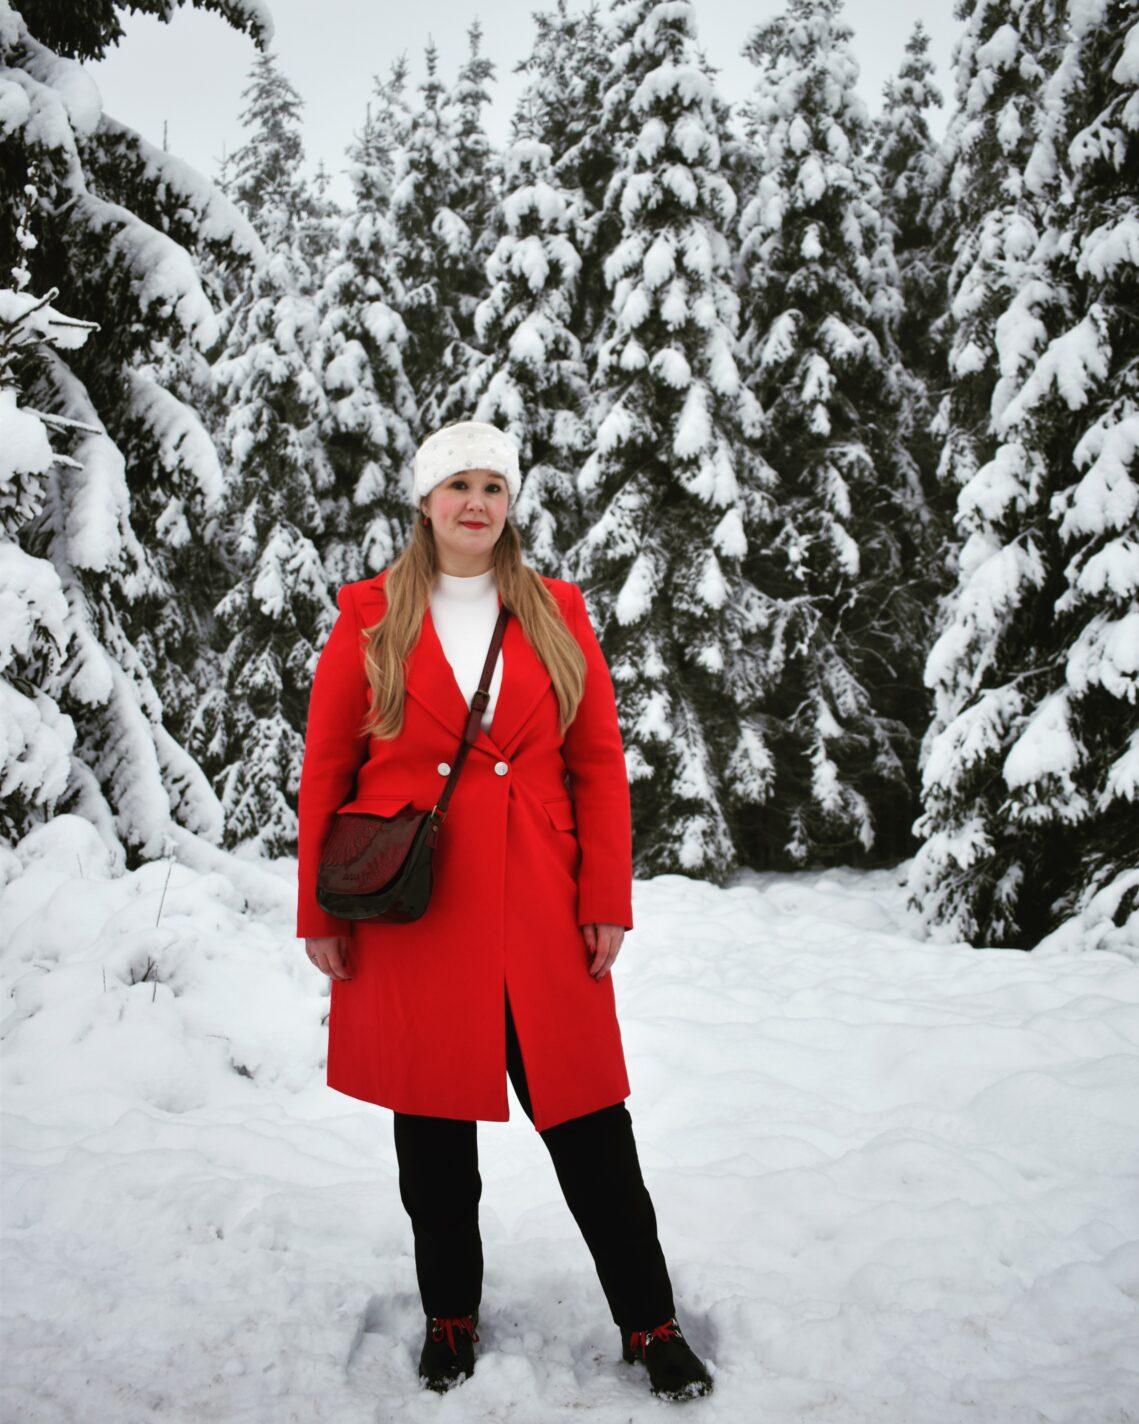 Valerie voyage en Belgique in les Hautes Fagnes - Interview met gastblogger Valerie